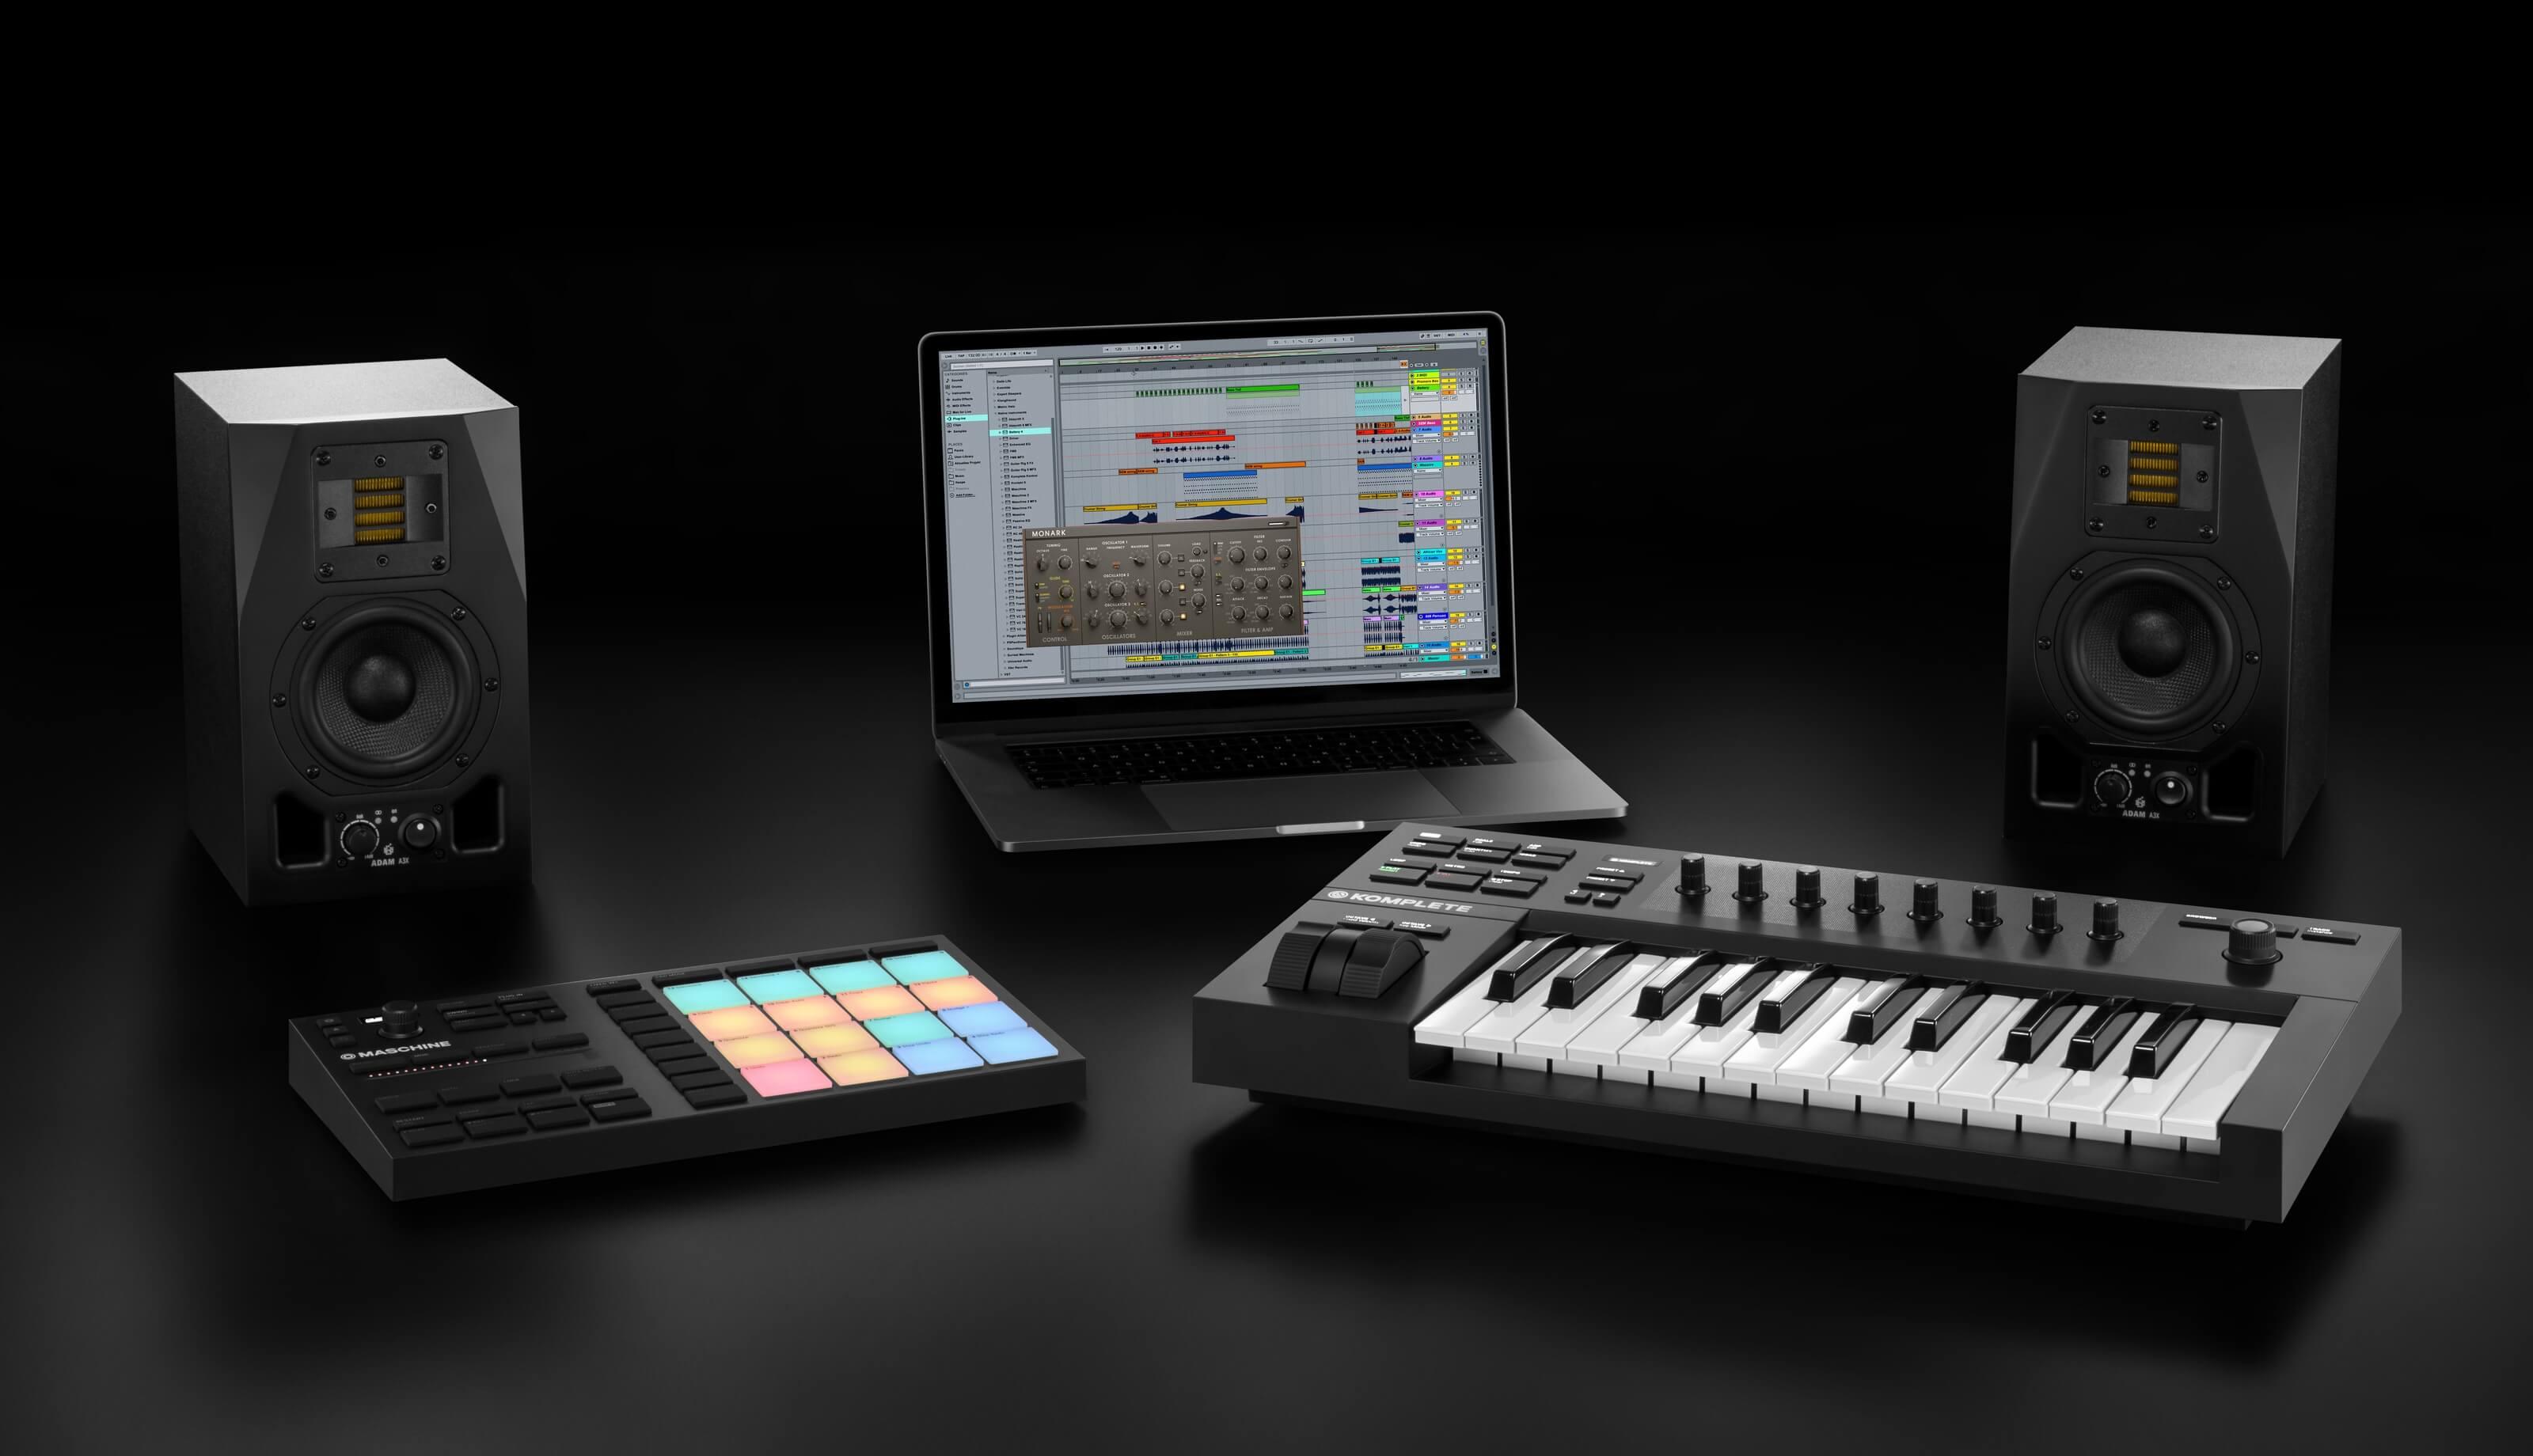 Drums For Sale >> Native Instruments reveals Komplete Kontrol A-Series, Maschine Mikro Mk3 & Traktor Kontrol S2